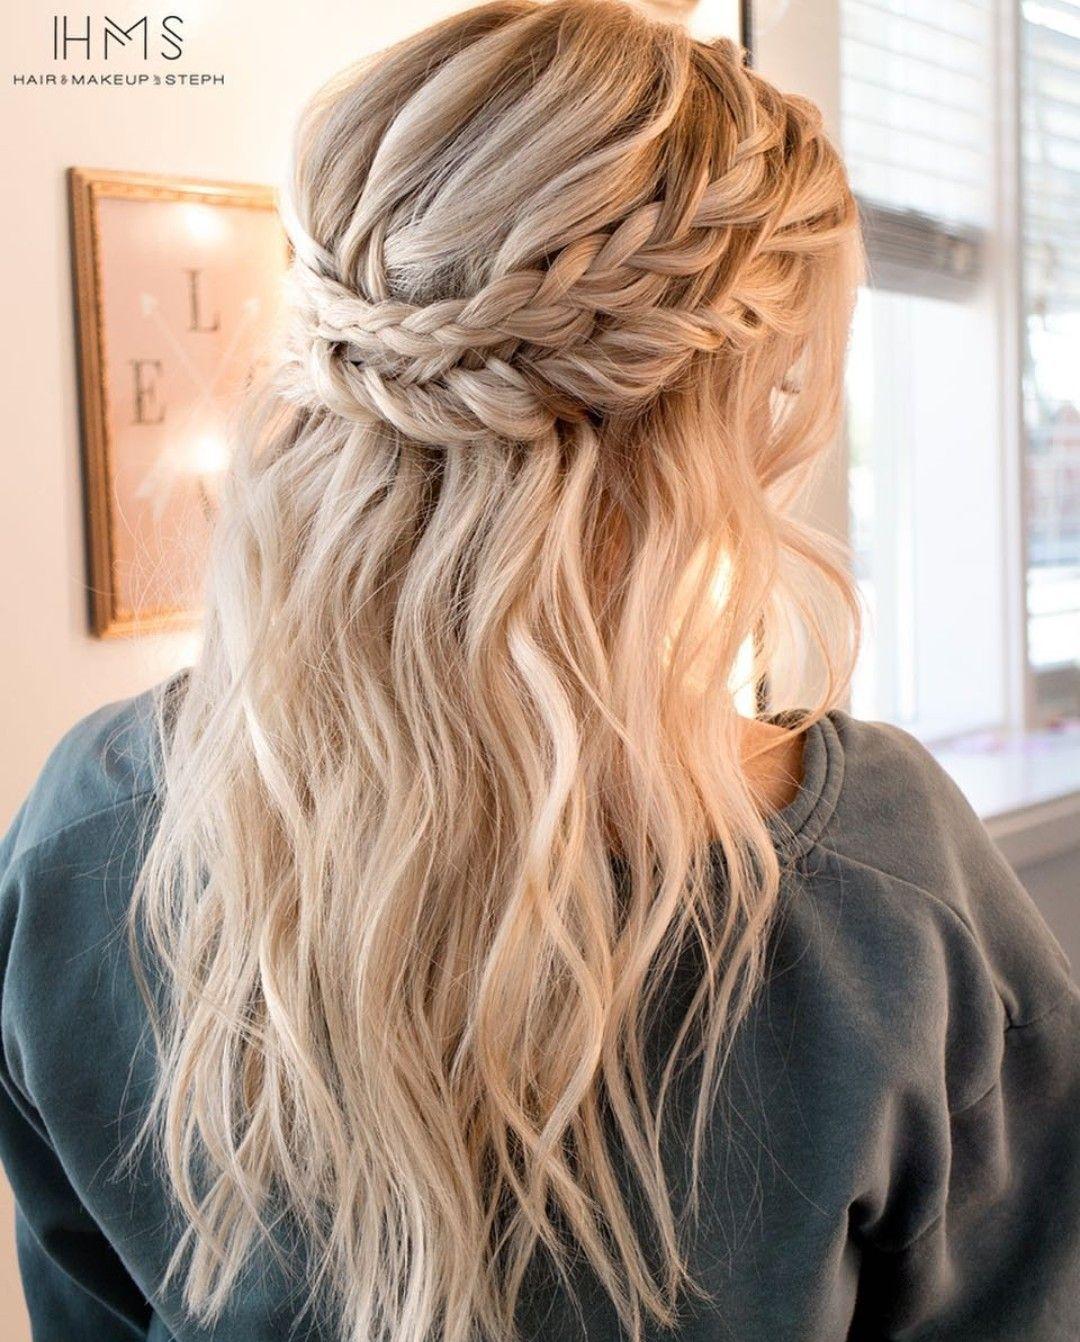 Pinterest jasmineejaneee hair ideas way too much work but so